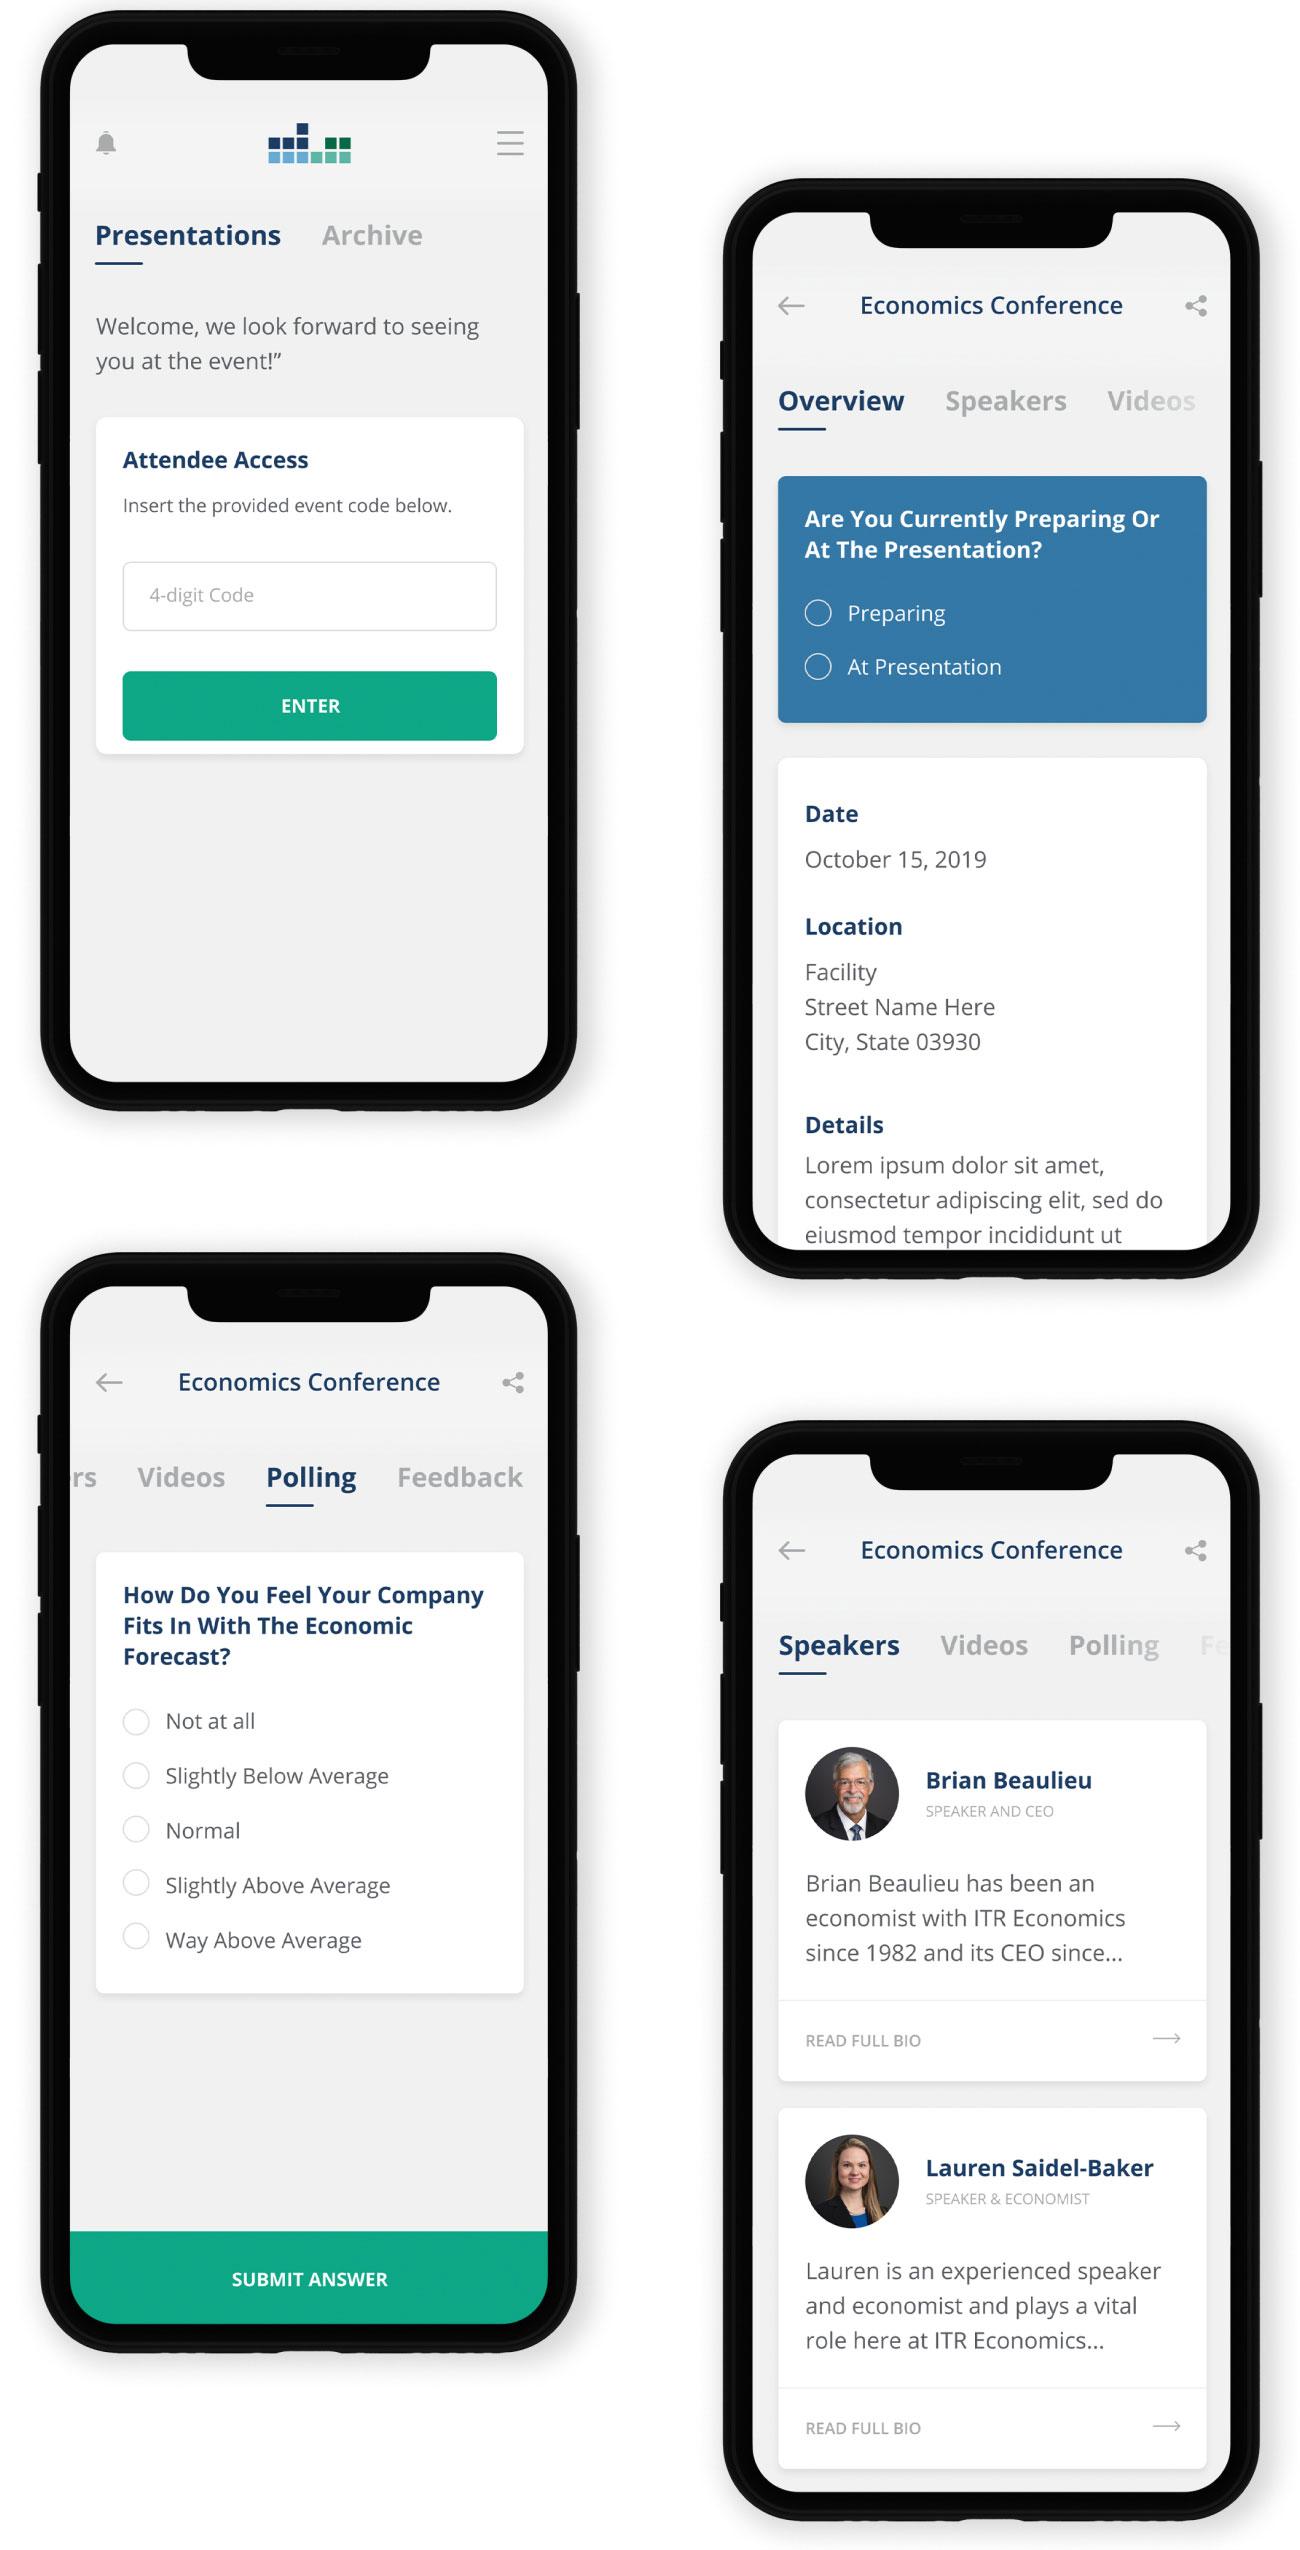 onDemand App presentation screens